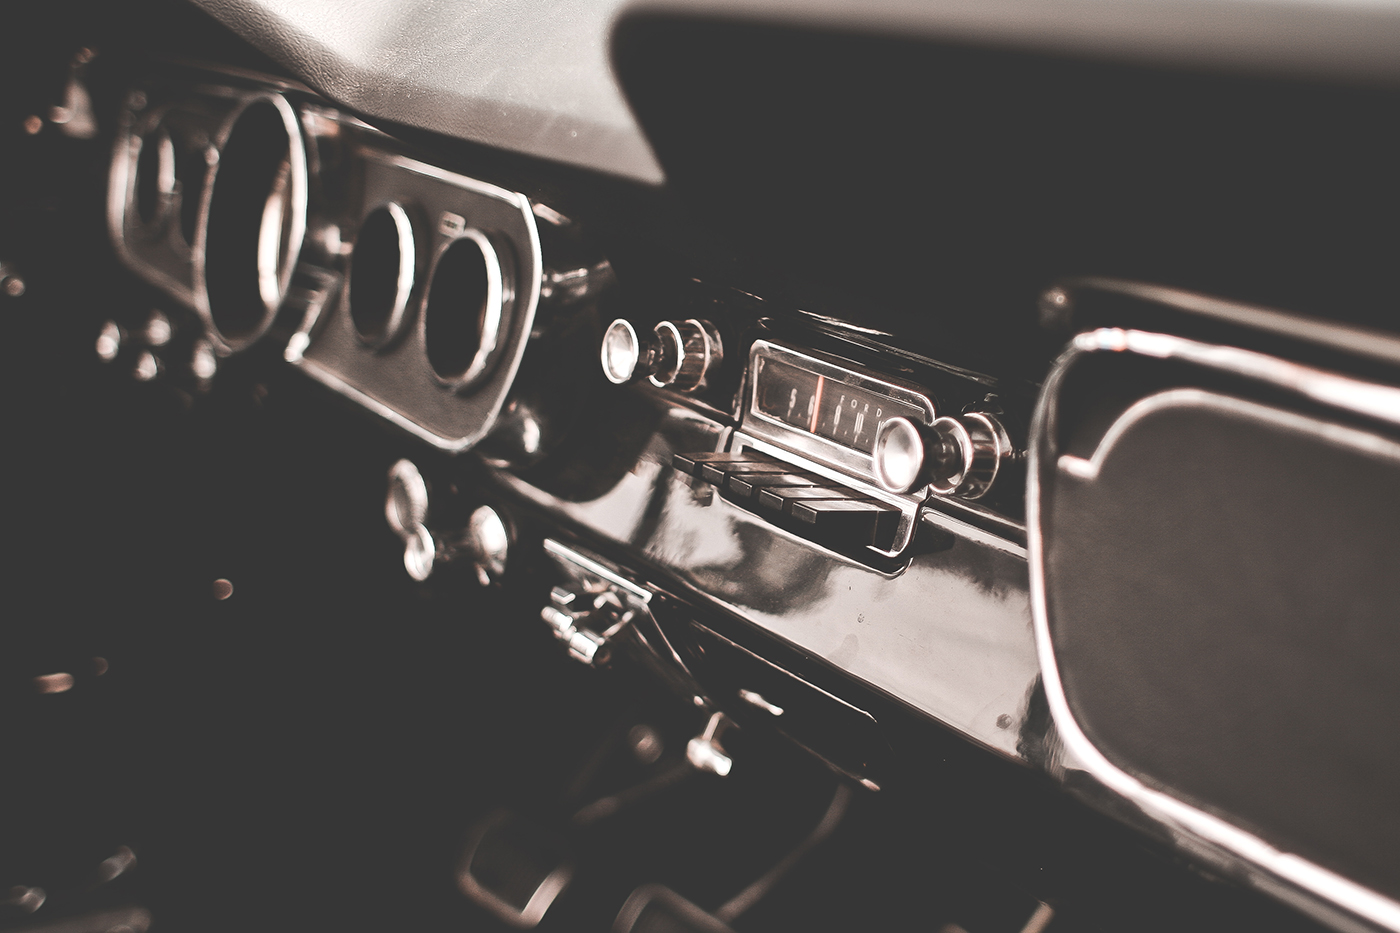 http://autobedrijfsmits.nl/wp-content/uploads/2016/12/retro-dashboard-in-veteran-car-picjumbo-com.jpg